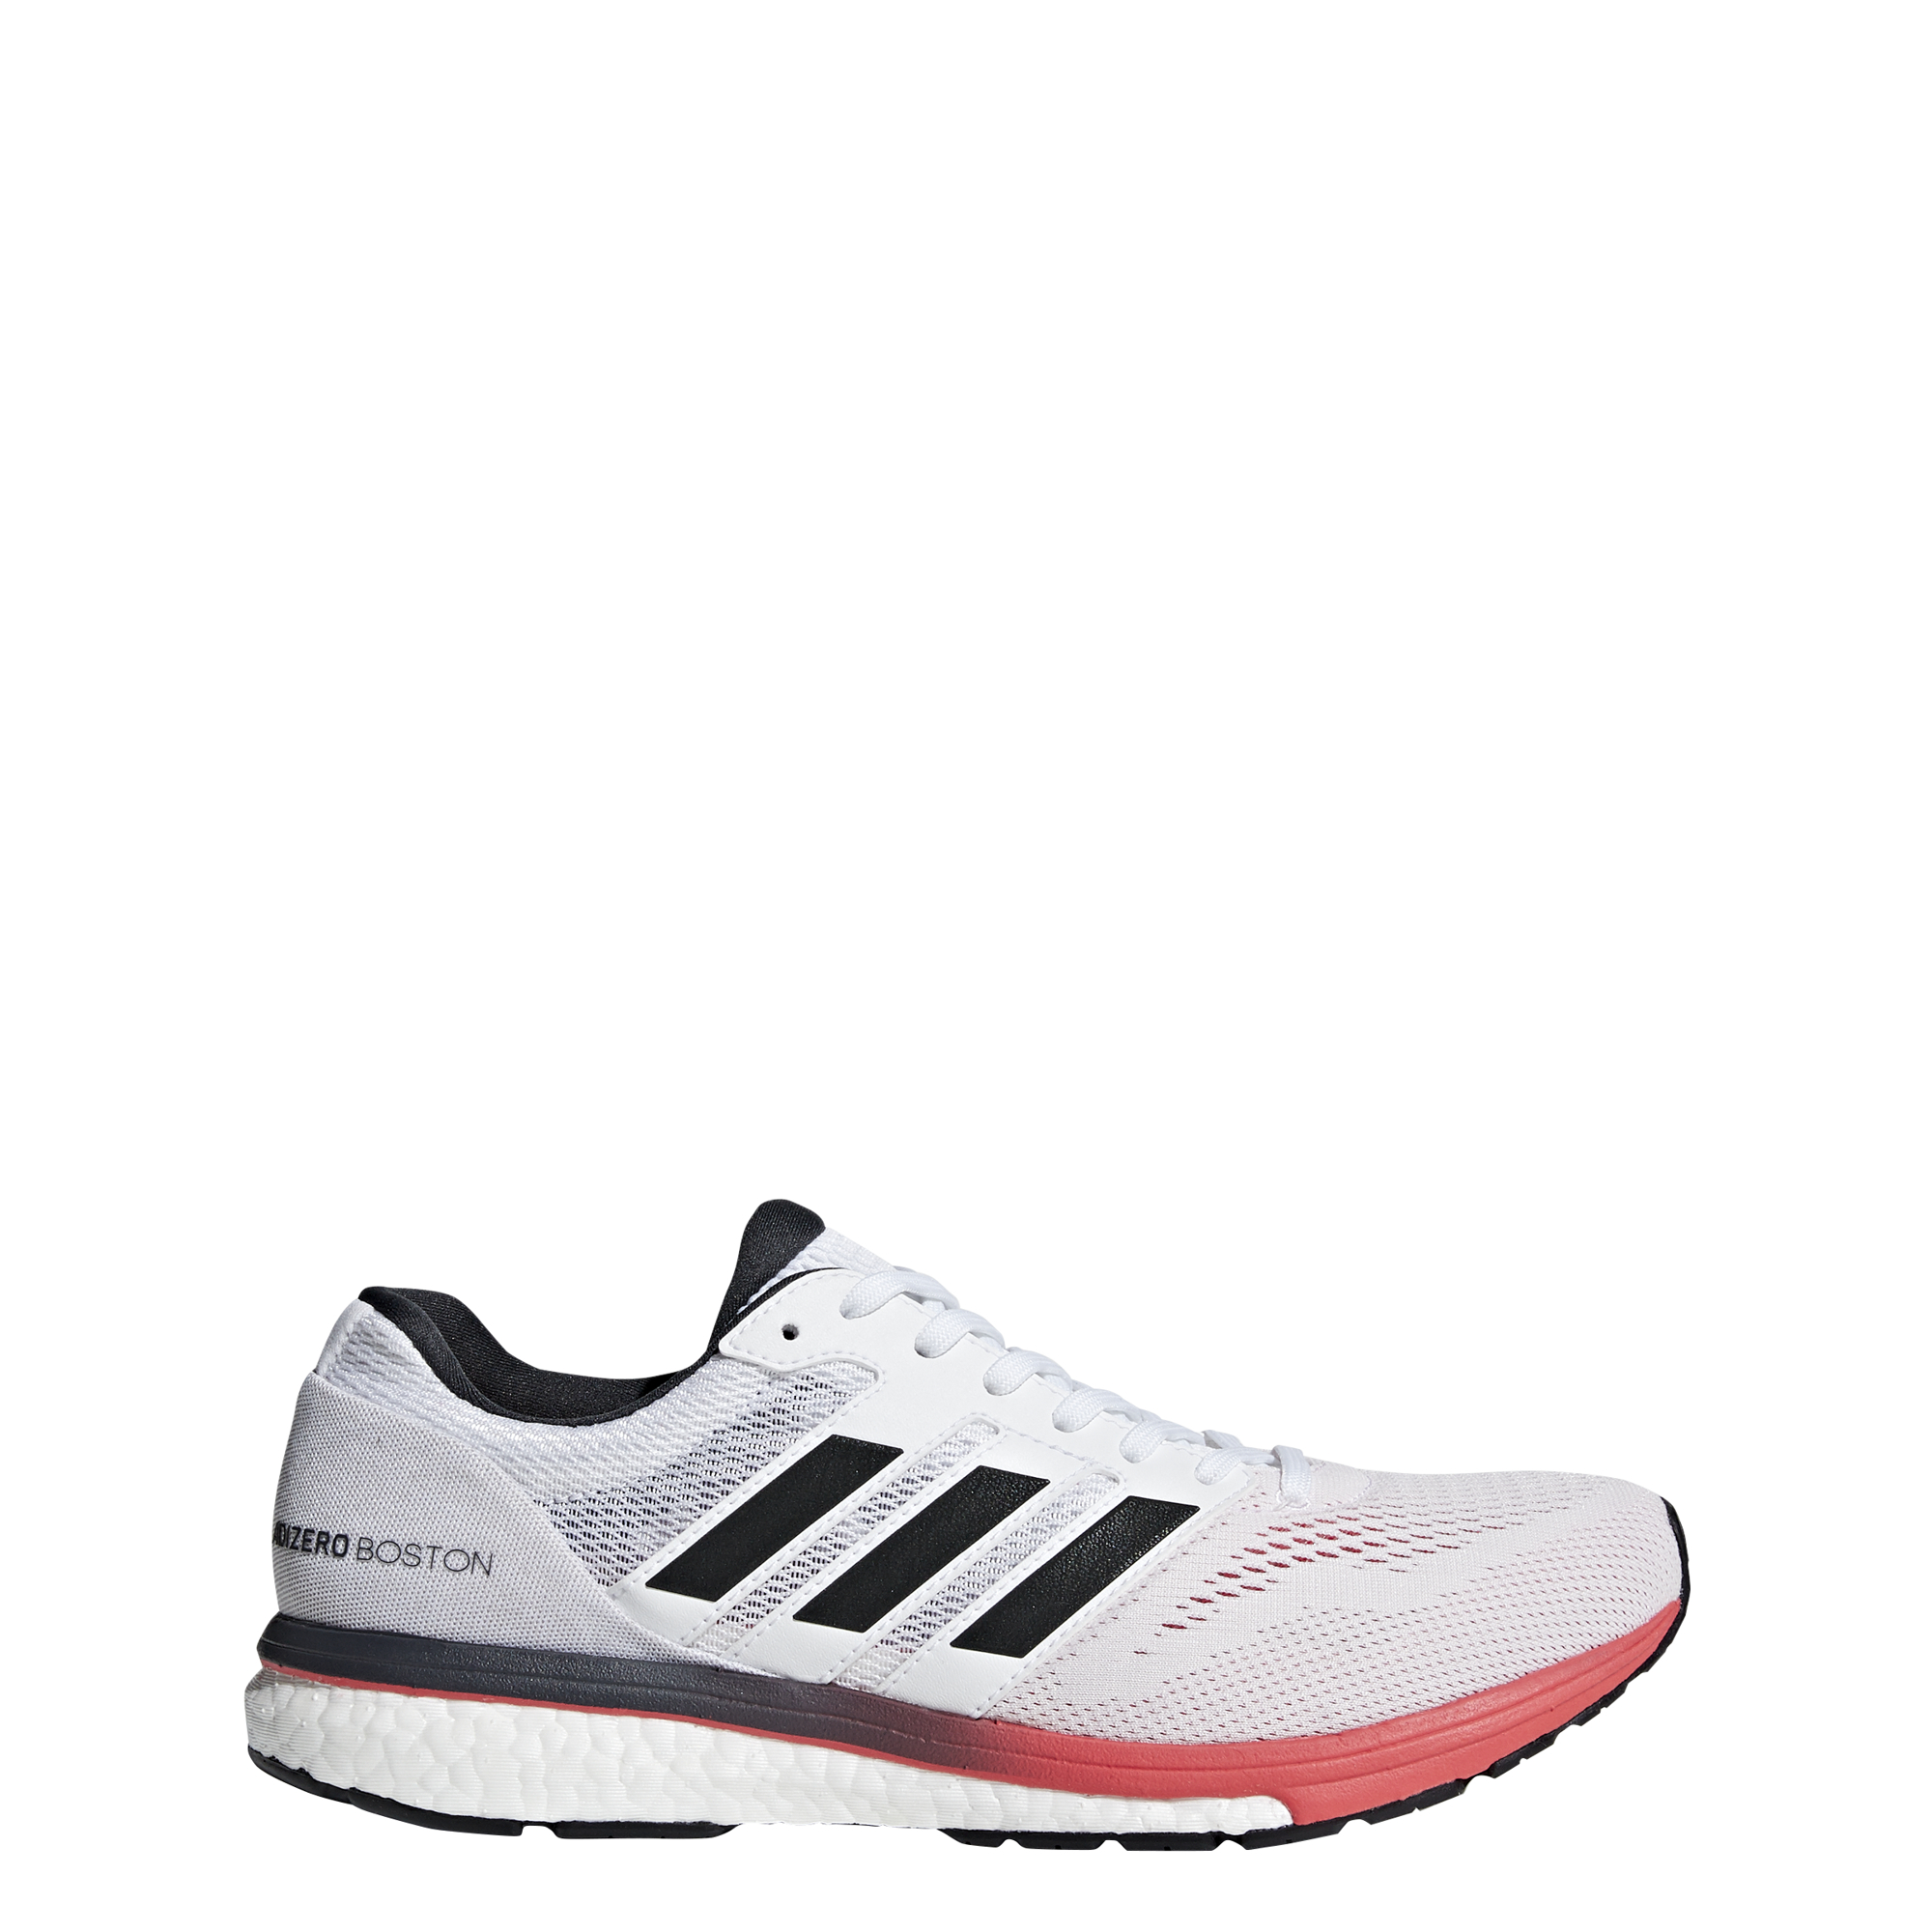 Adidas 99 grams adizero My Thoughts